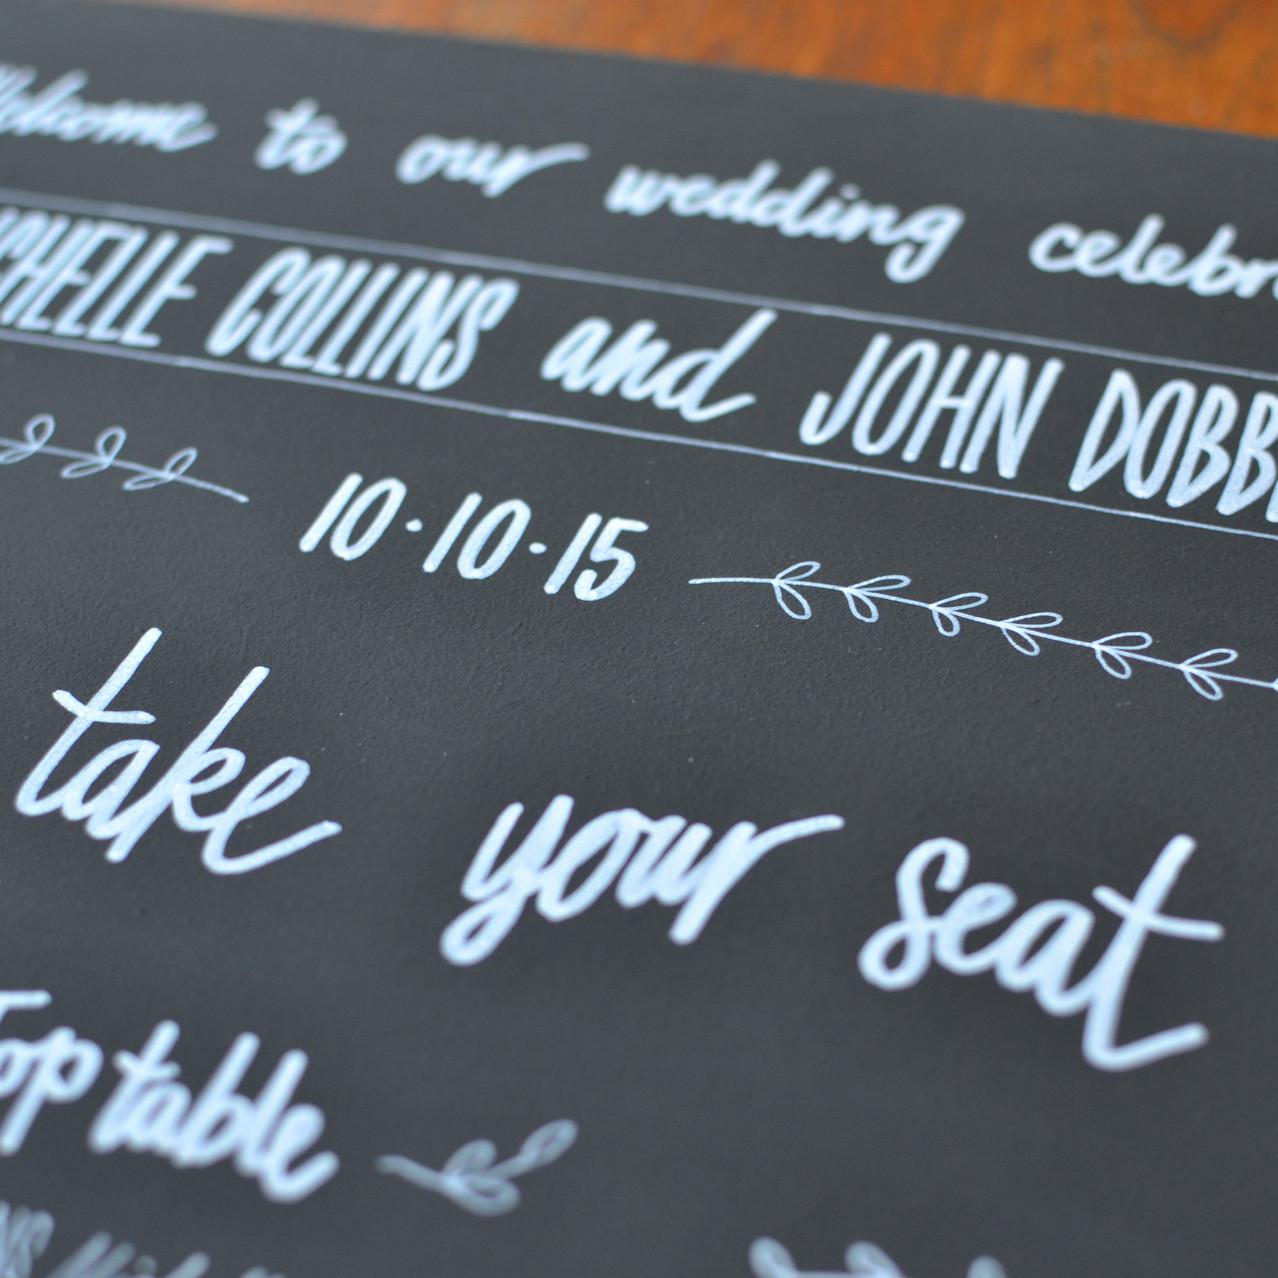 Chalkboard table plan - Michelle and John (11)